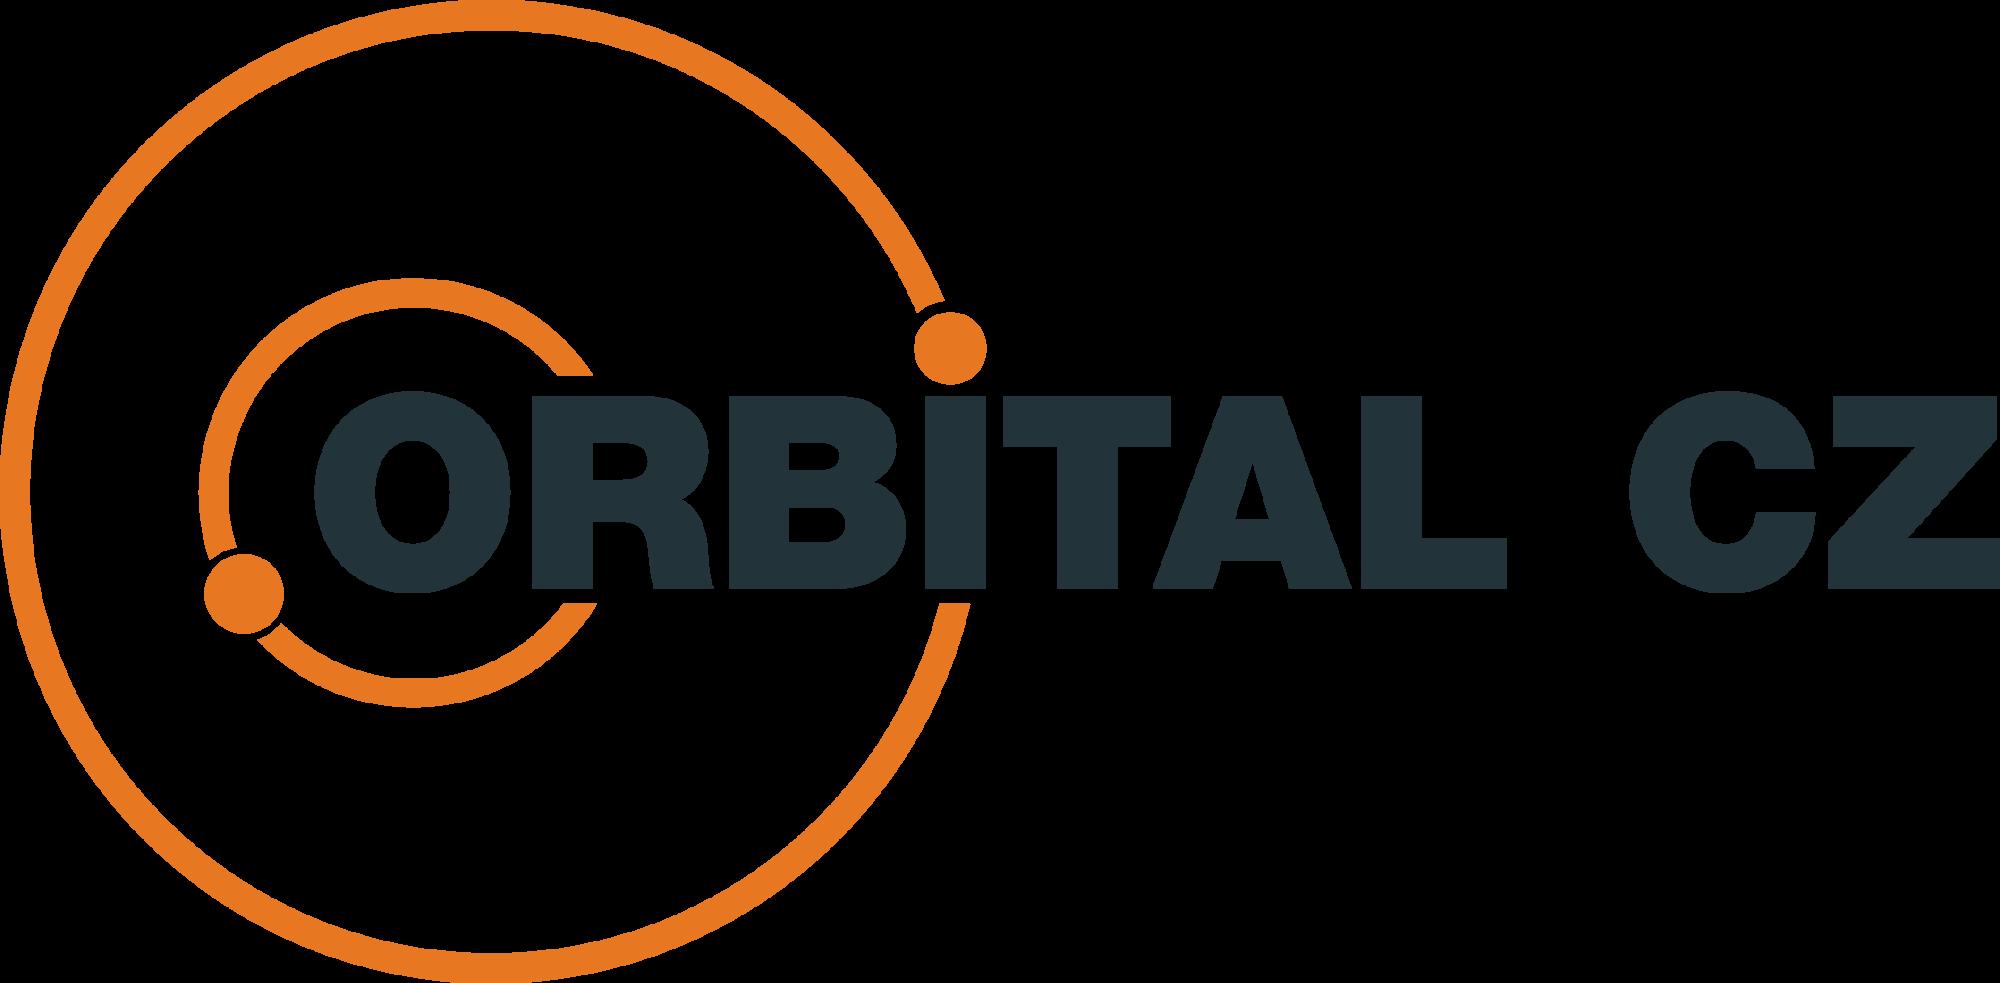 Orbital CZ